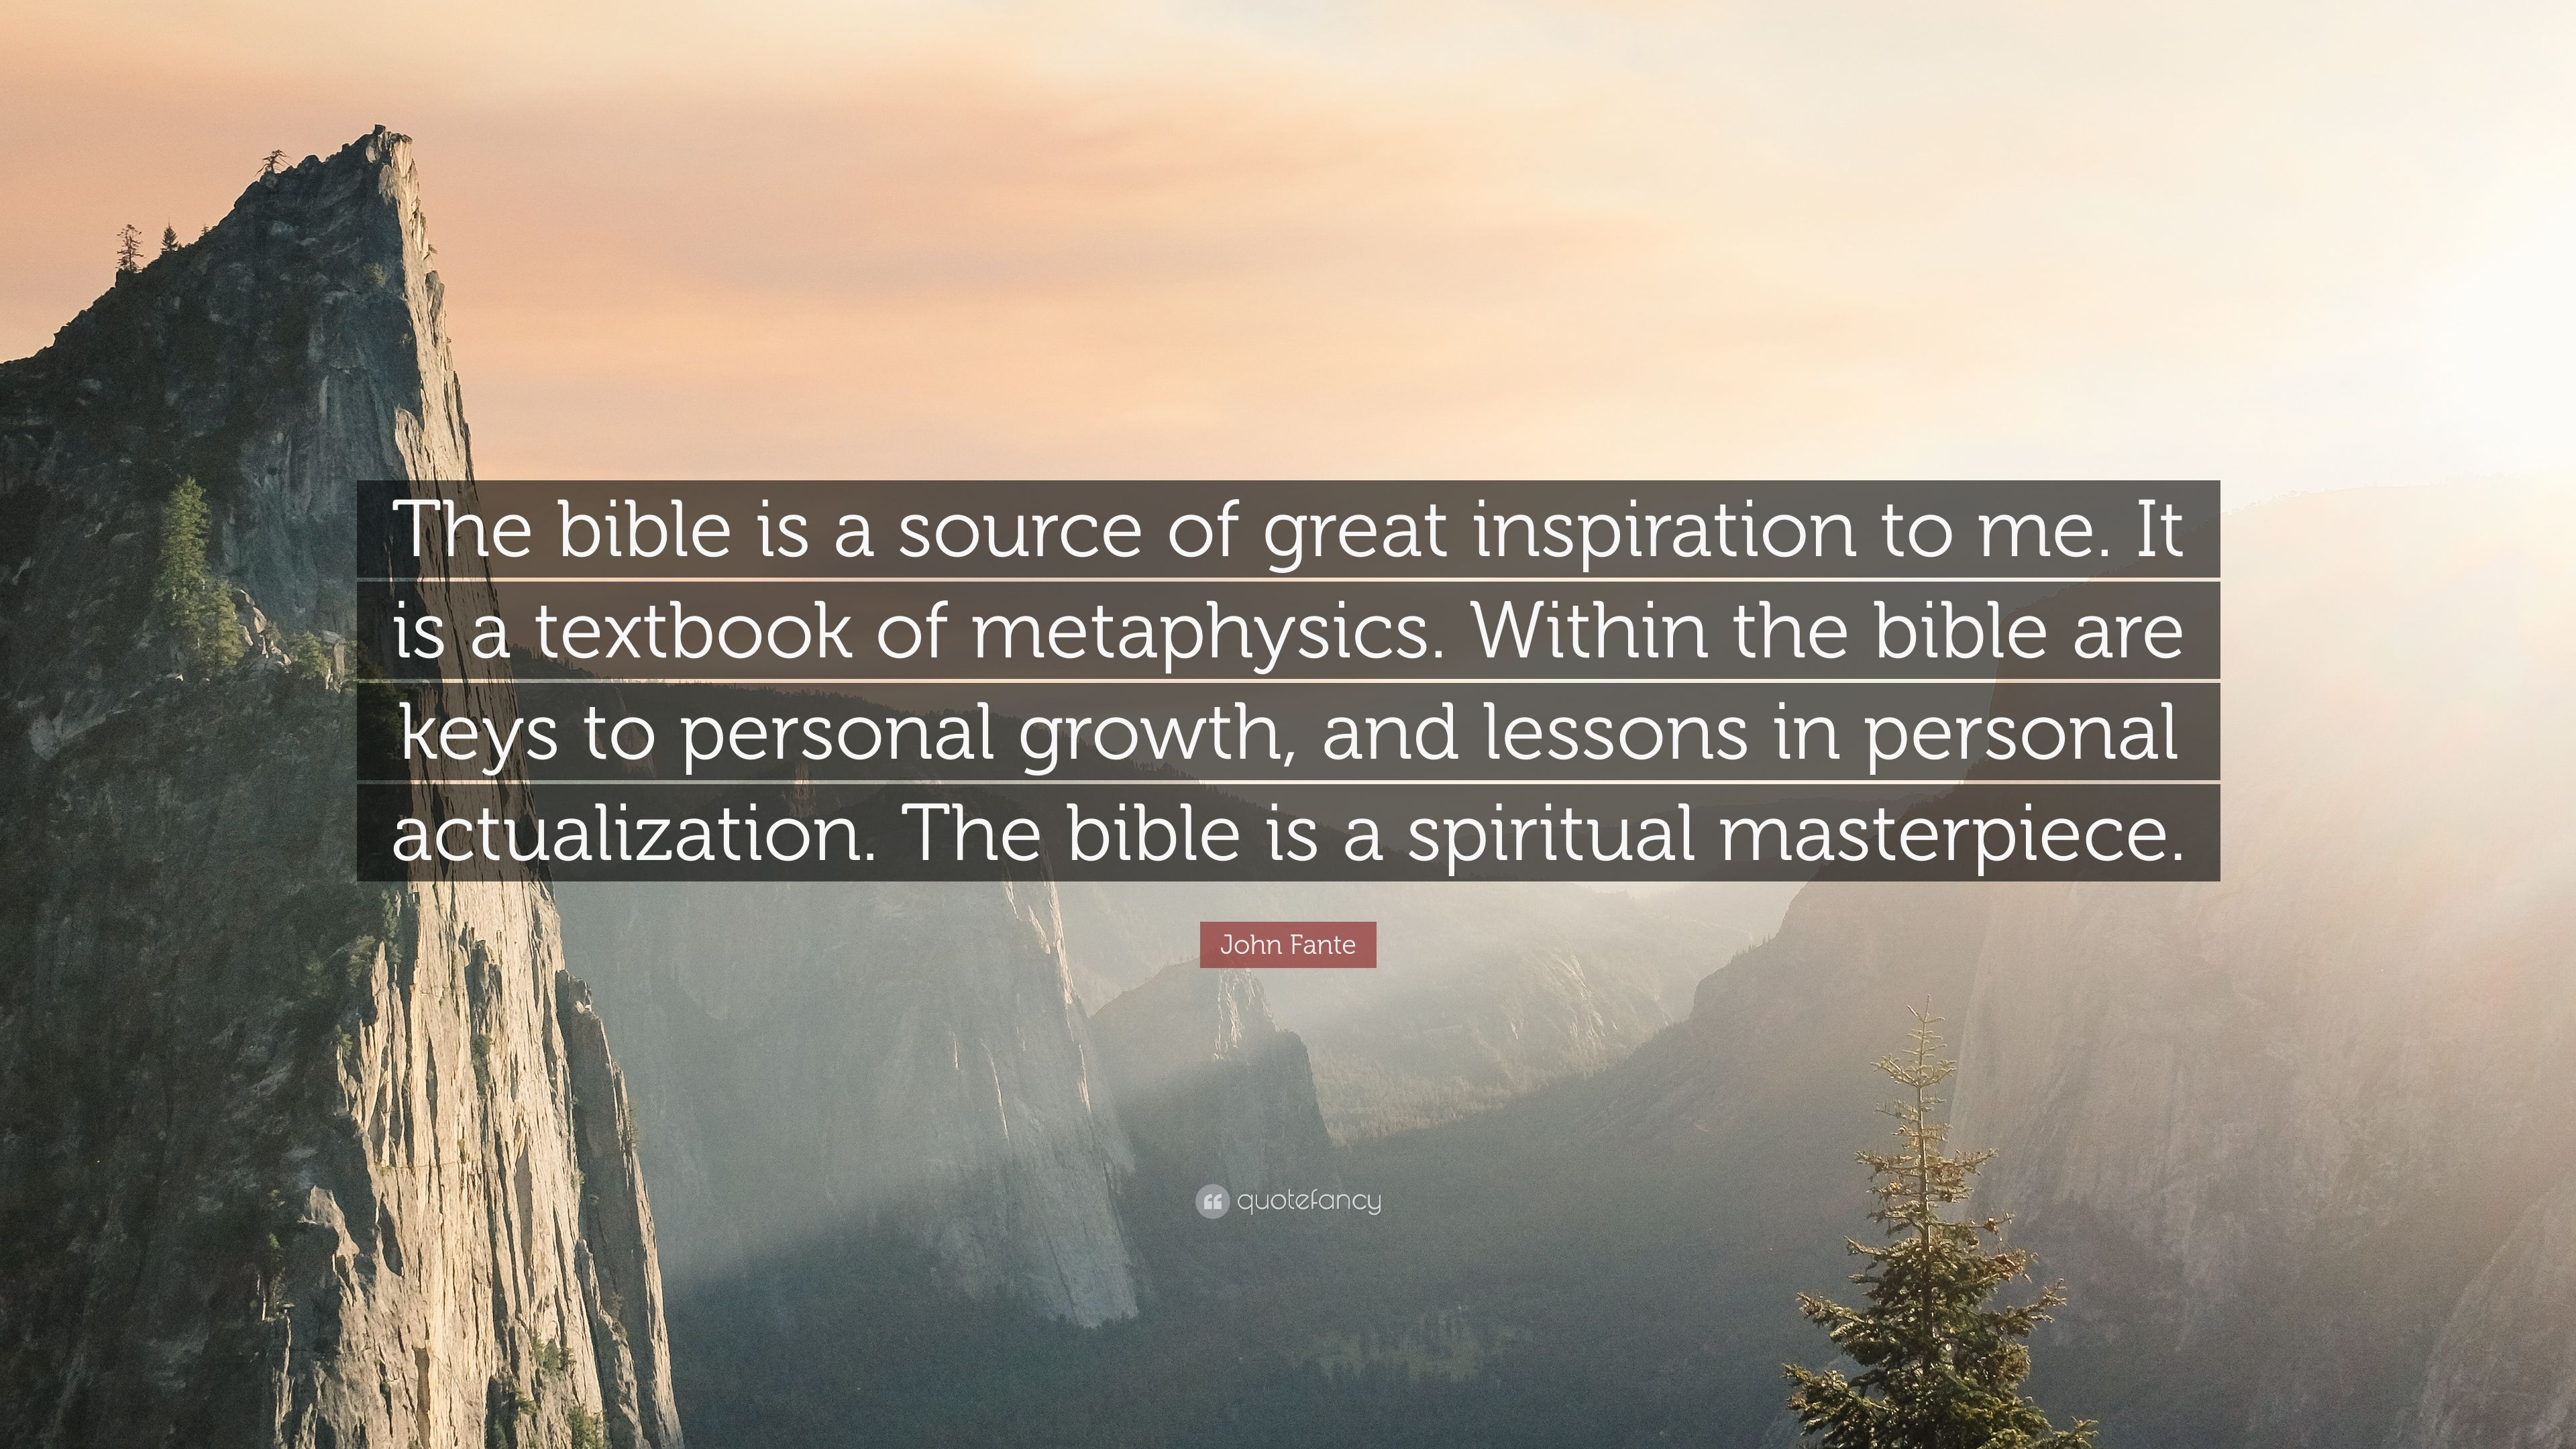 Bible metaphysics